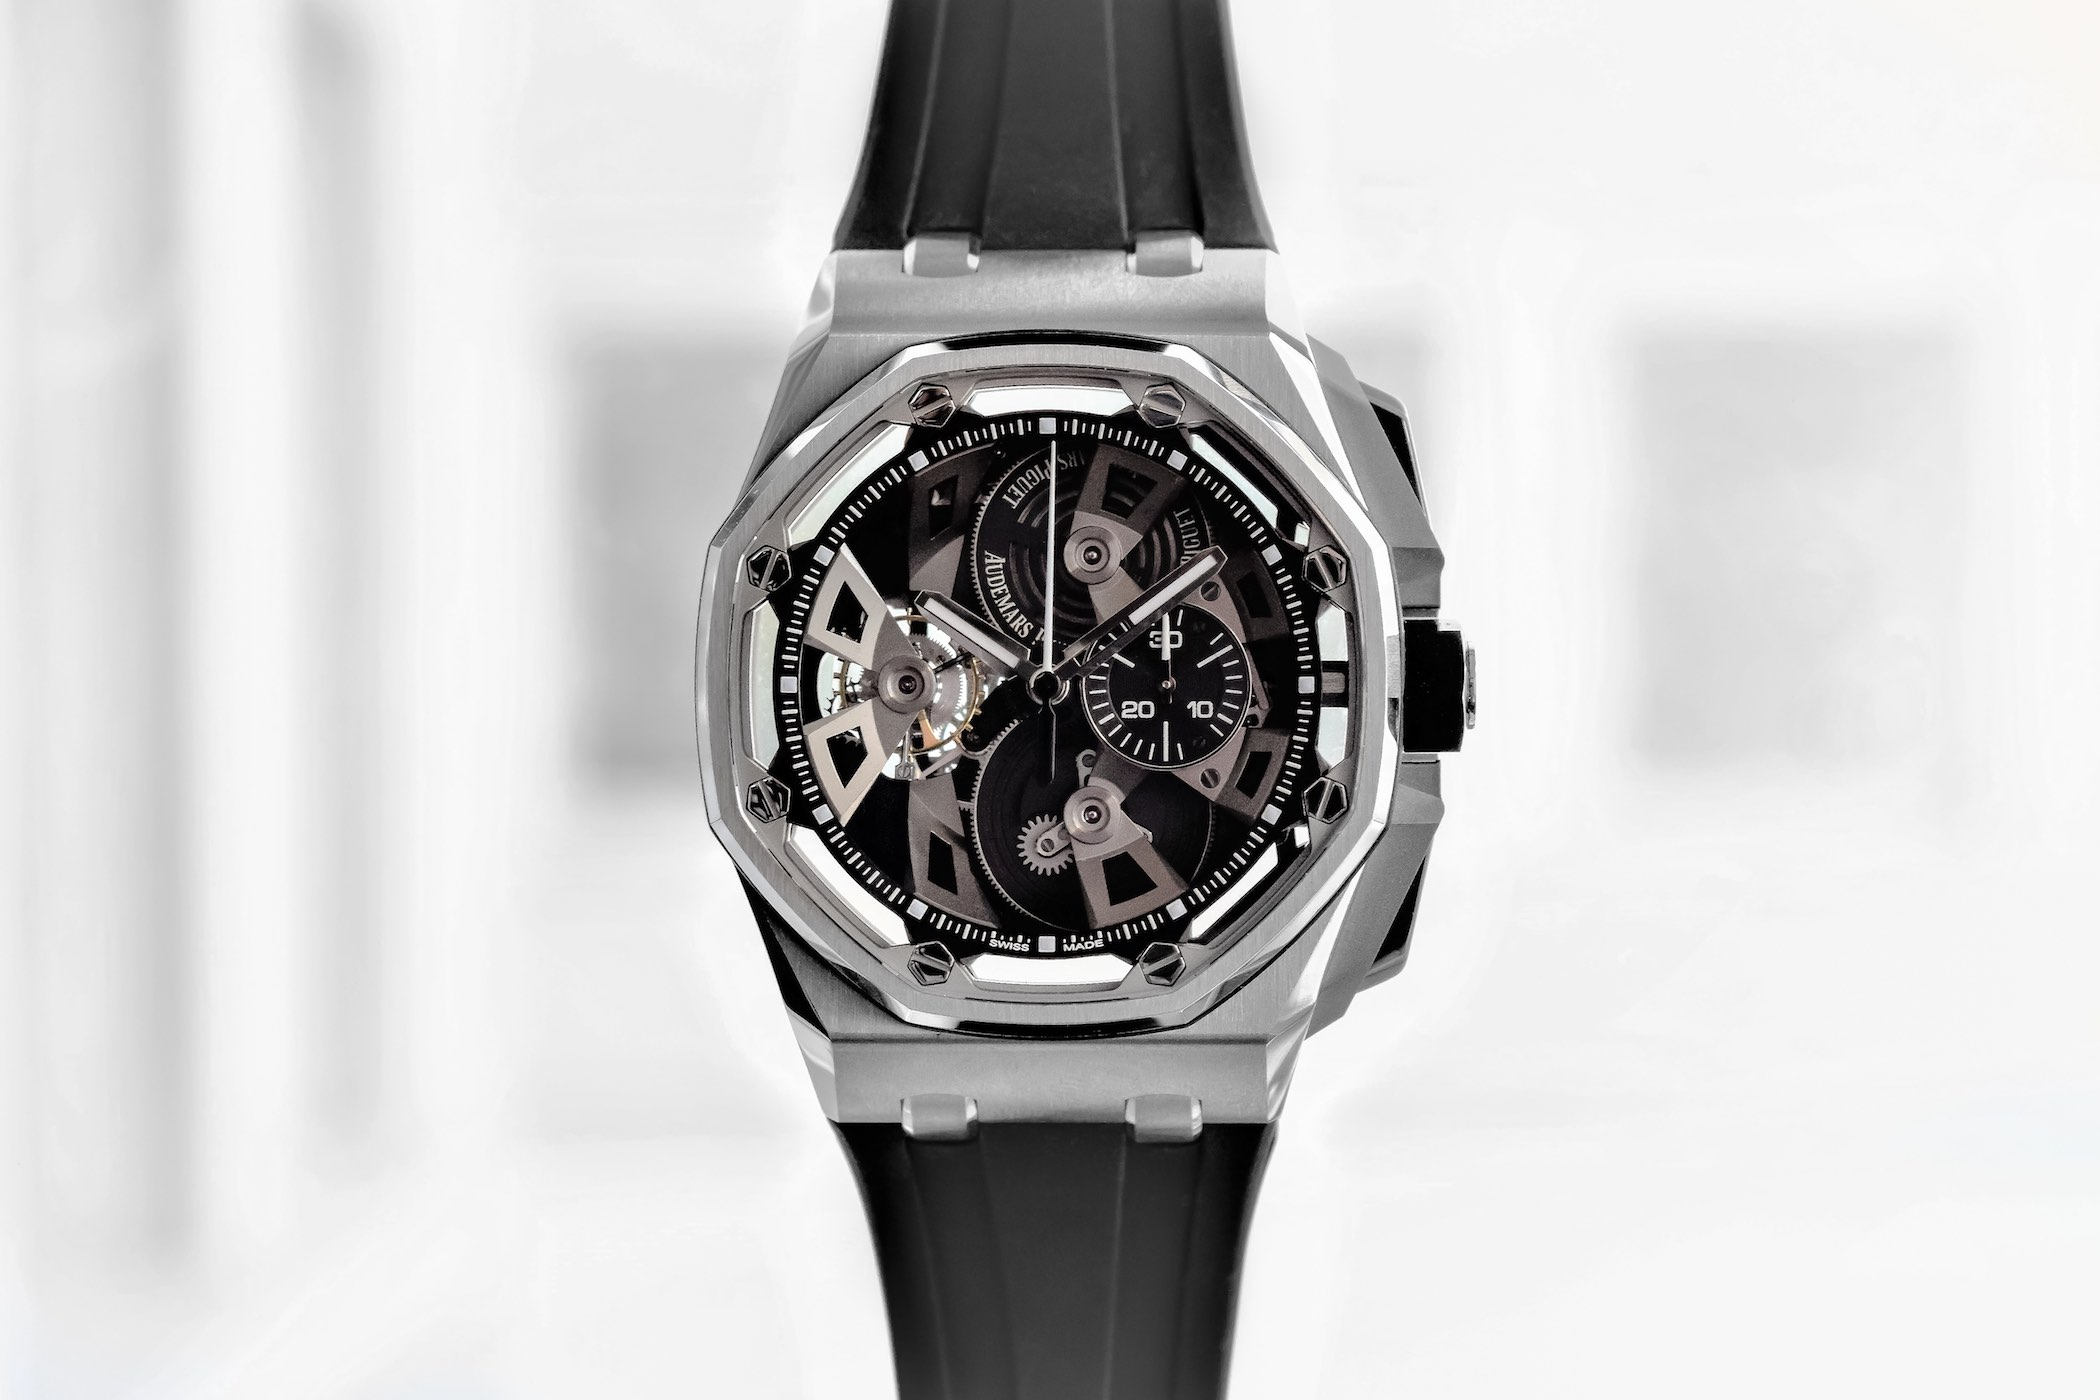 Audemars Piguet Royal Oak Offshore Tourbillon Chronograph 25th anniversary 26421